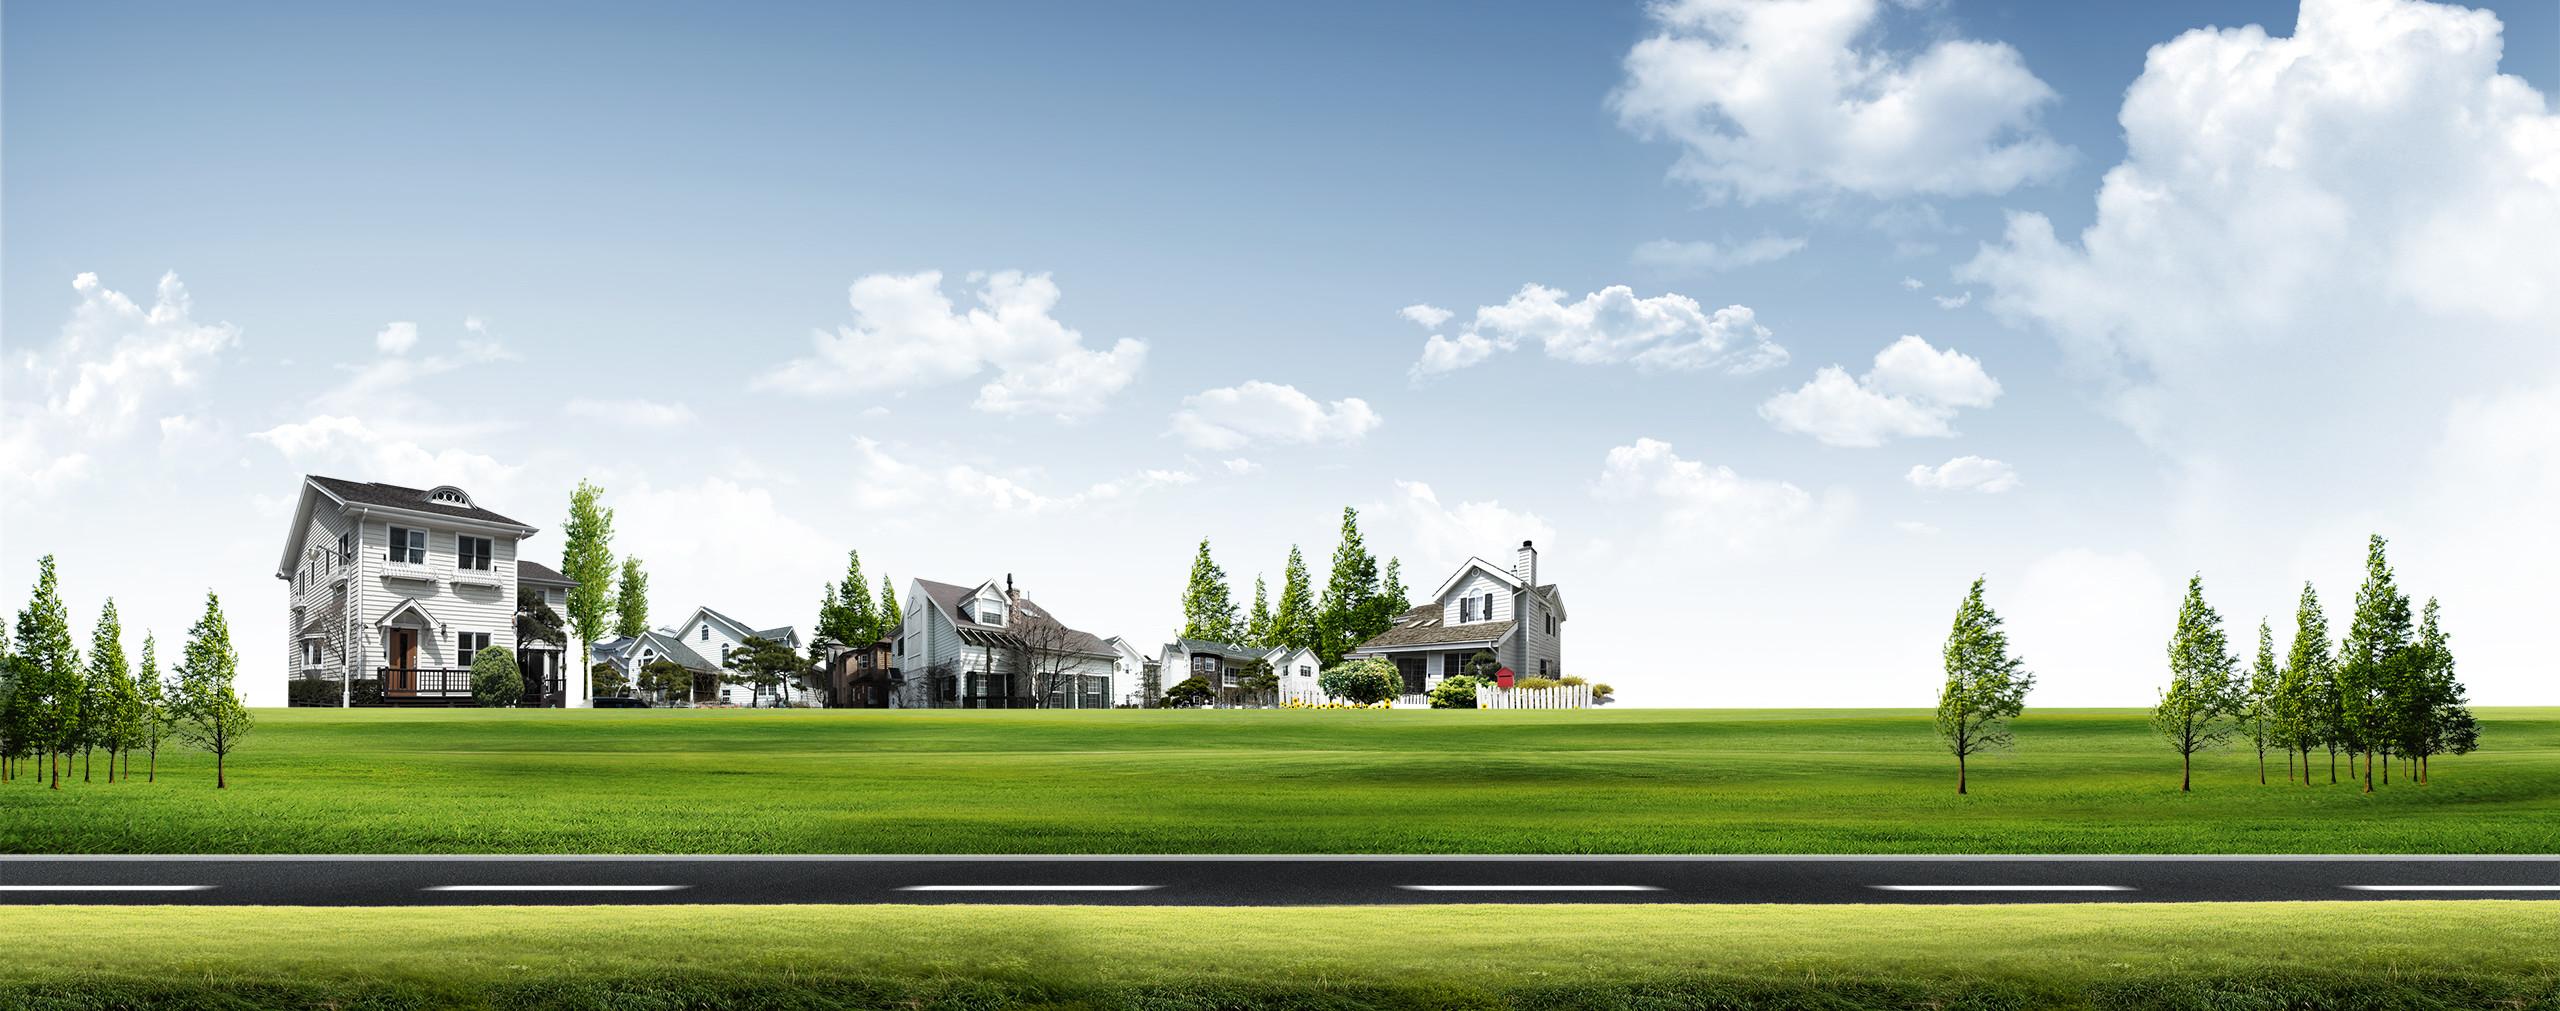 New house landscape. photo